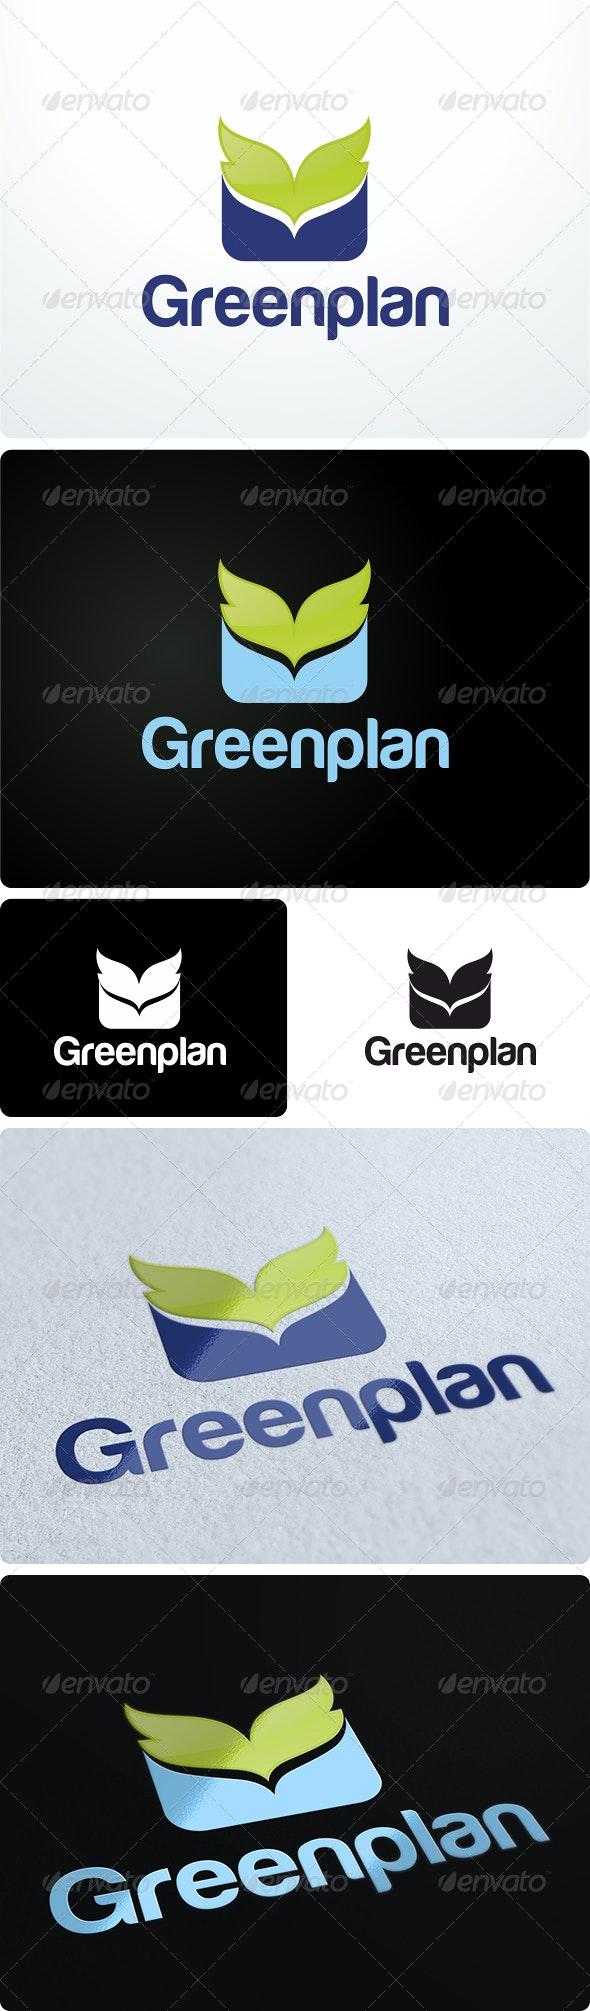 Greenplan Environmental Logo Design - Symbols Logo Templates